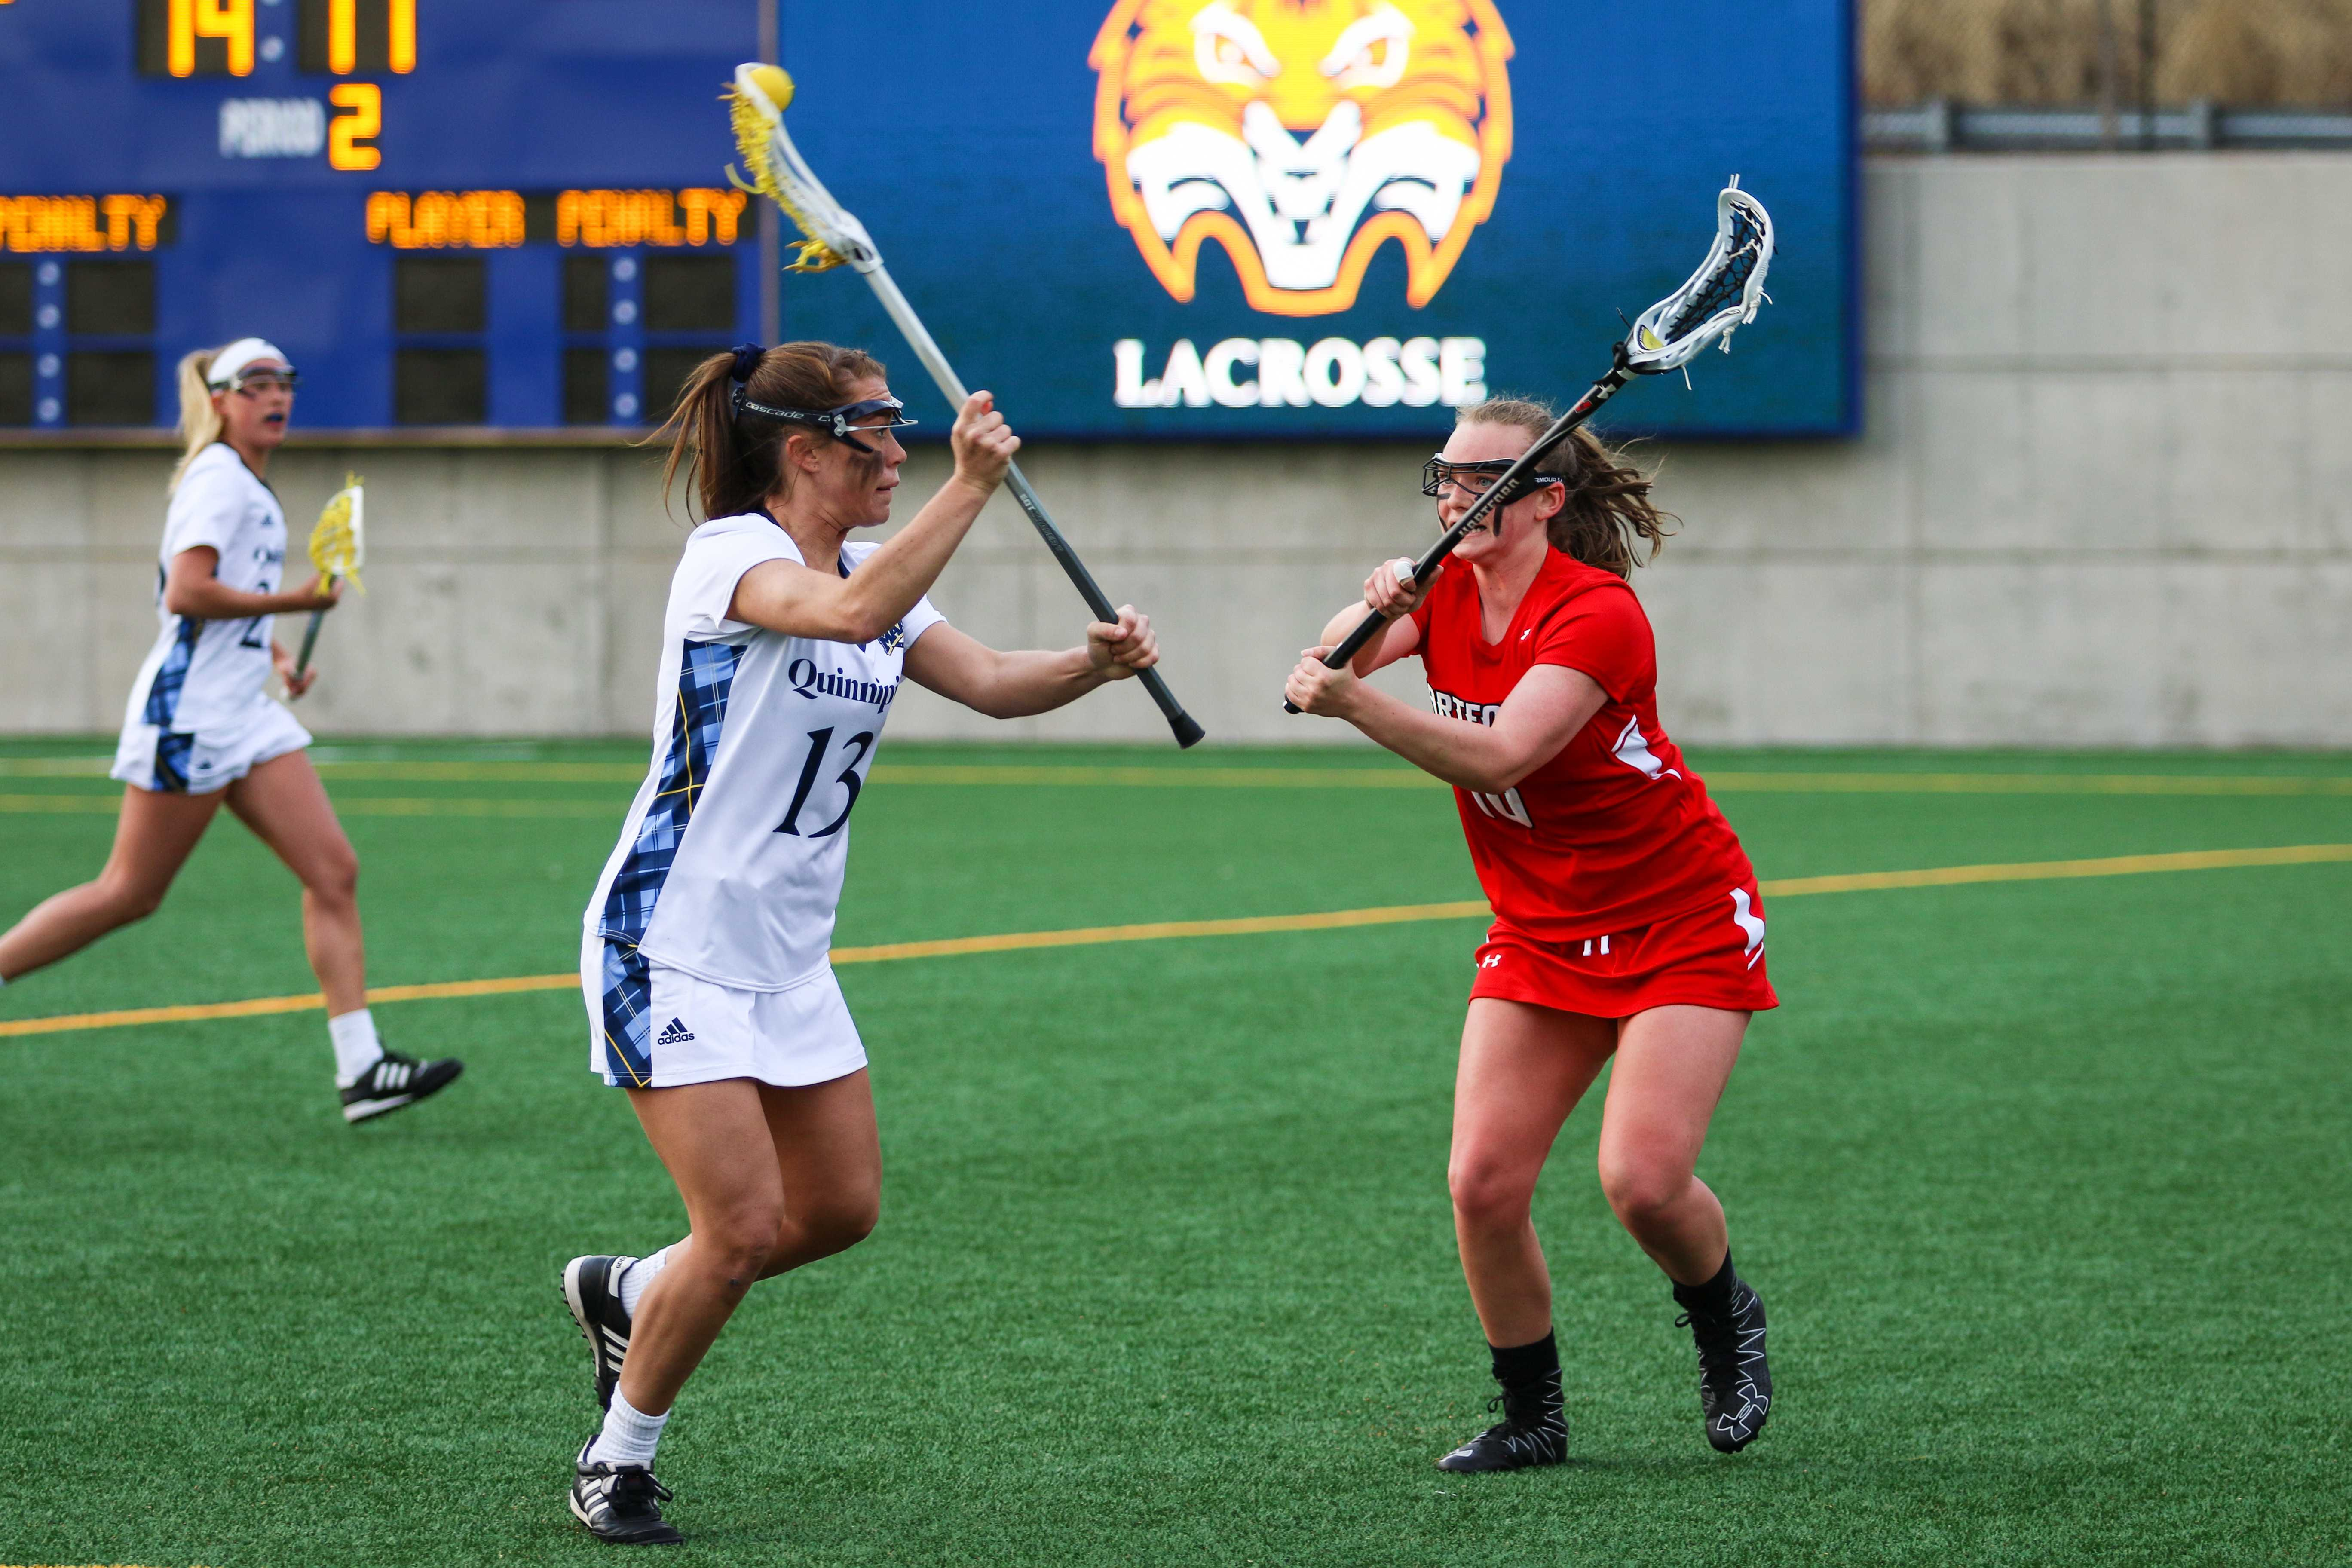 Quinnipiac women's lacrosse dominant in 16-4 win over Hartford